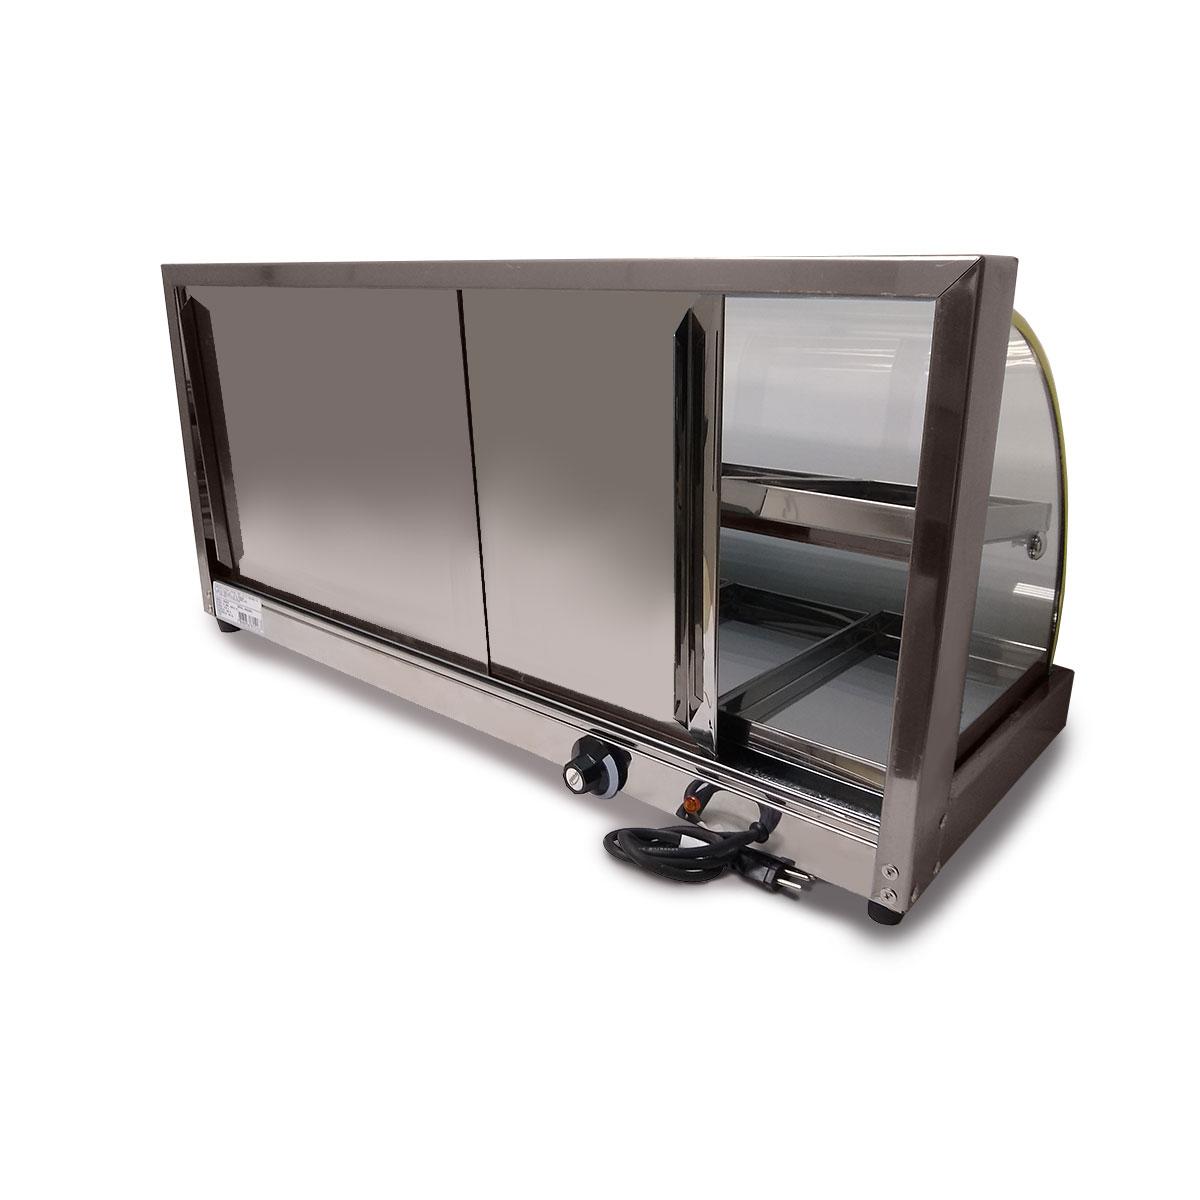 Estufa Vidro Curvo Dupla 8 Bandejas Em Linha Luxo - Supritecs  - Carmel Equipamentos